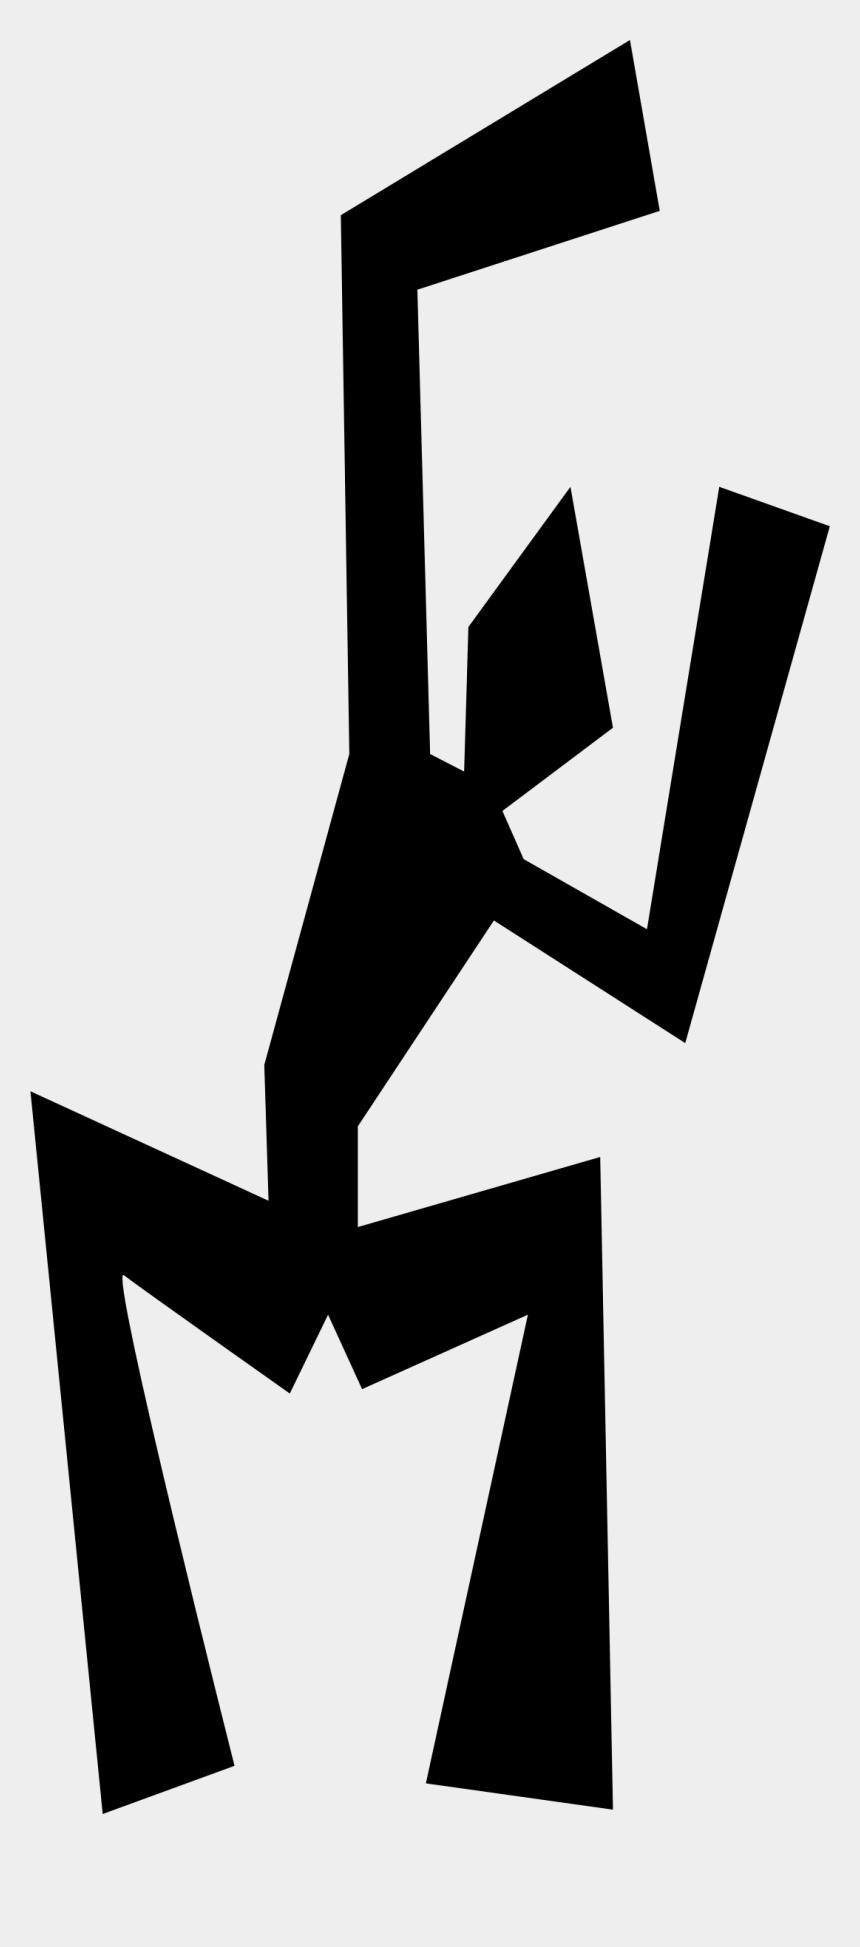 line dancers clipart, Cartoons - Dancer Big Image Png Ⓒ - Graphic Design